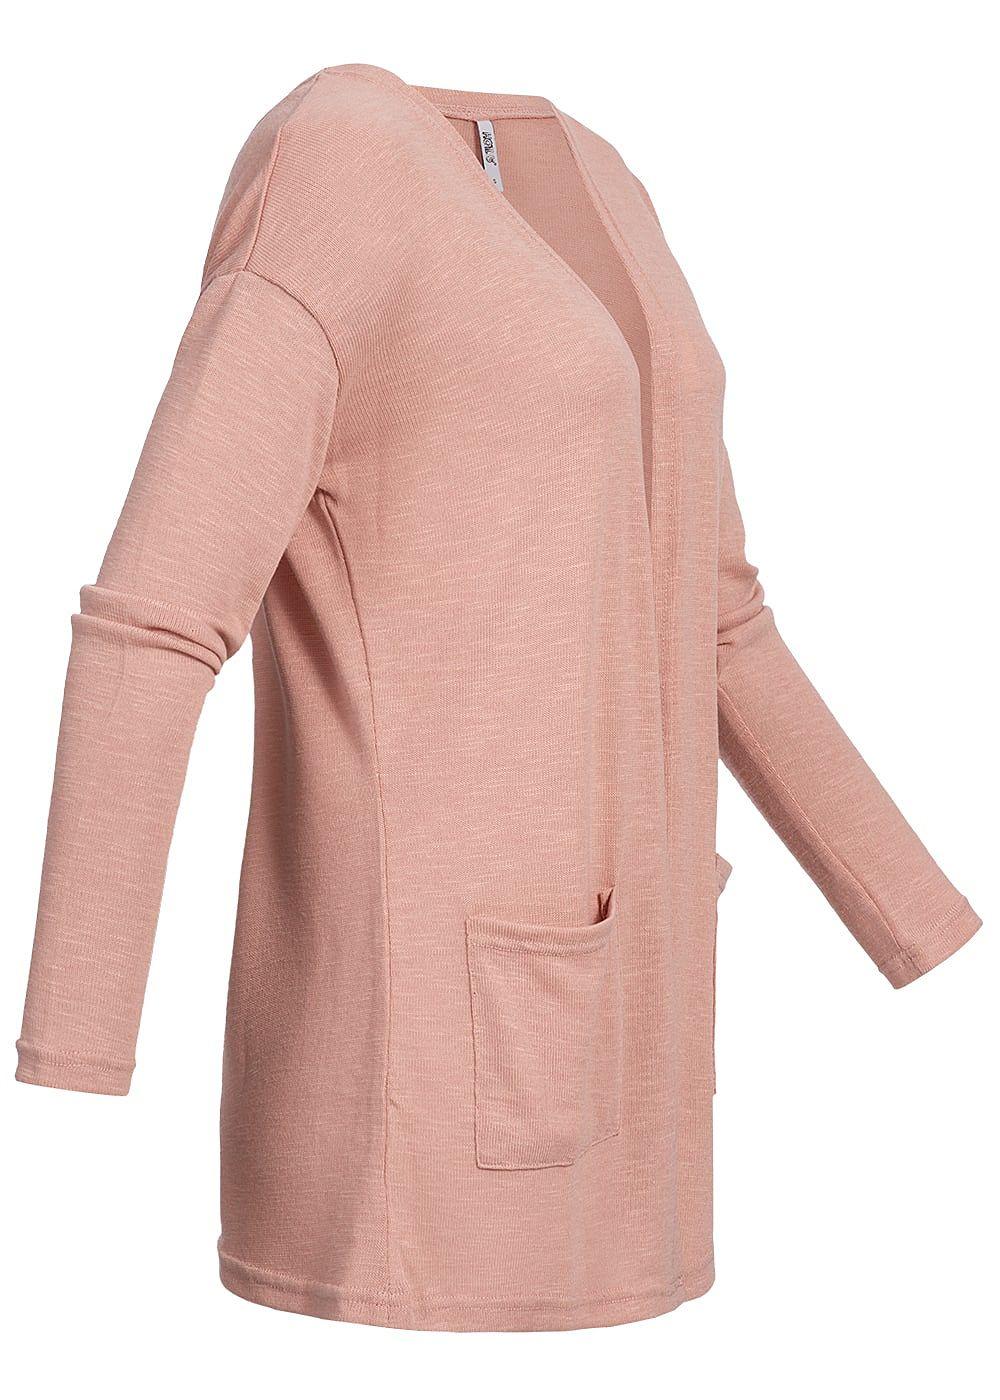 87ccb50120e188 Hailys Damen Kurz Cardigan 2 Taschen rosa - 77onlineshop